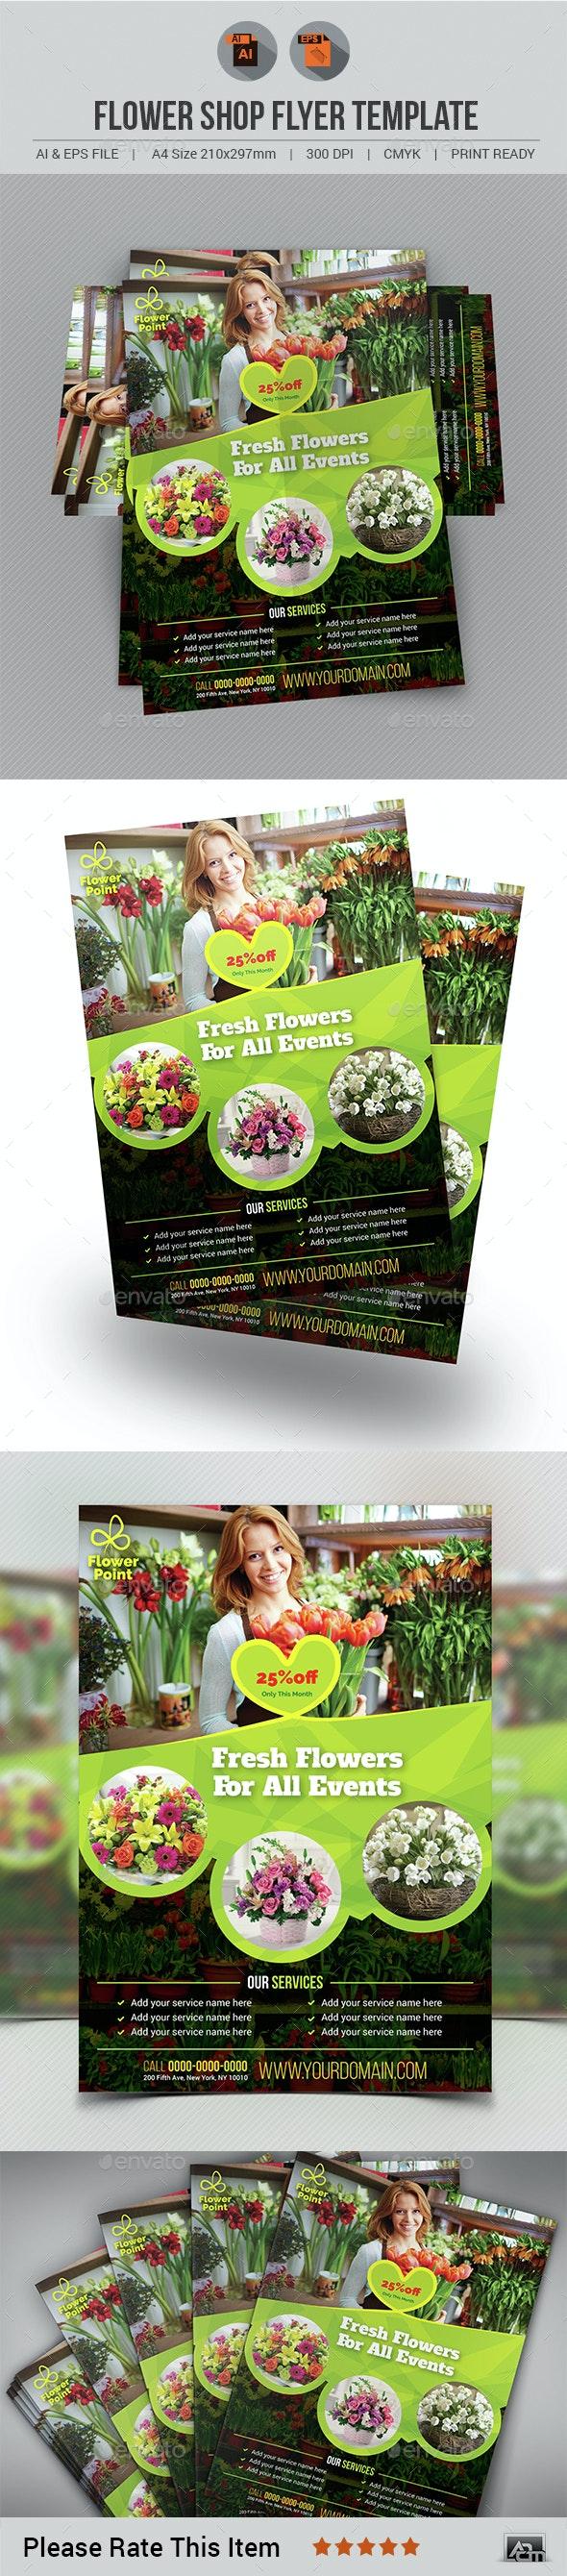 Flower Shop Flyer - Corporate Flyers